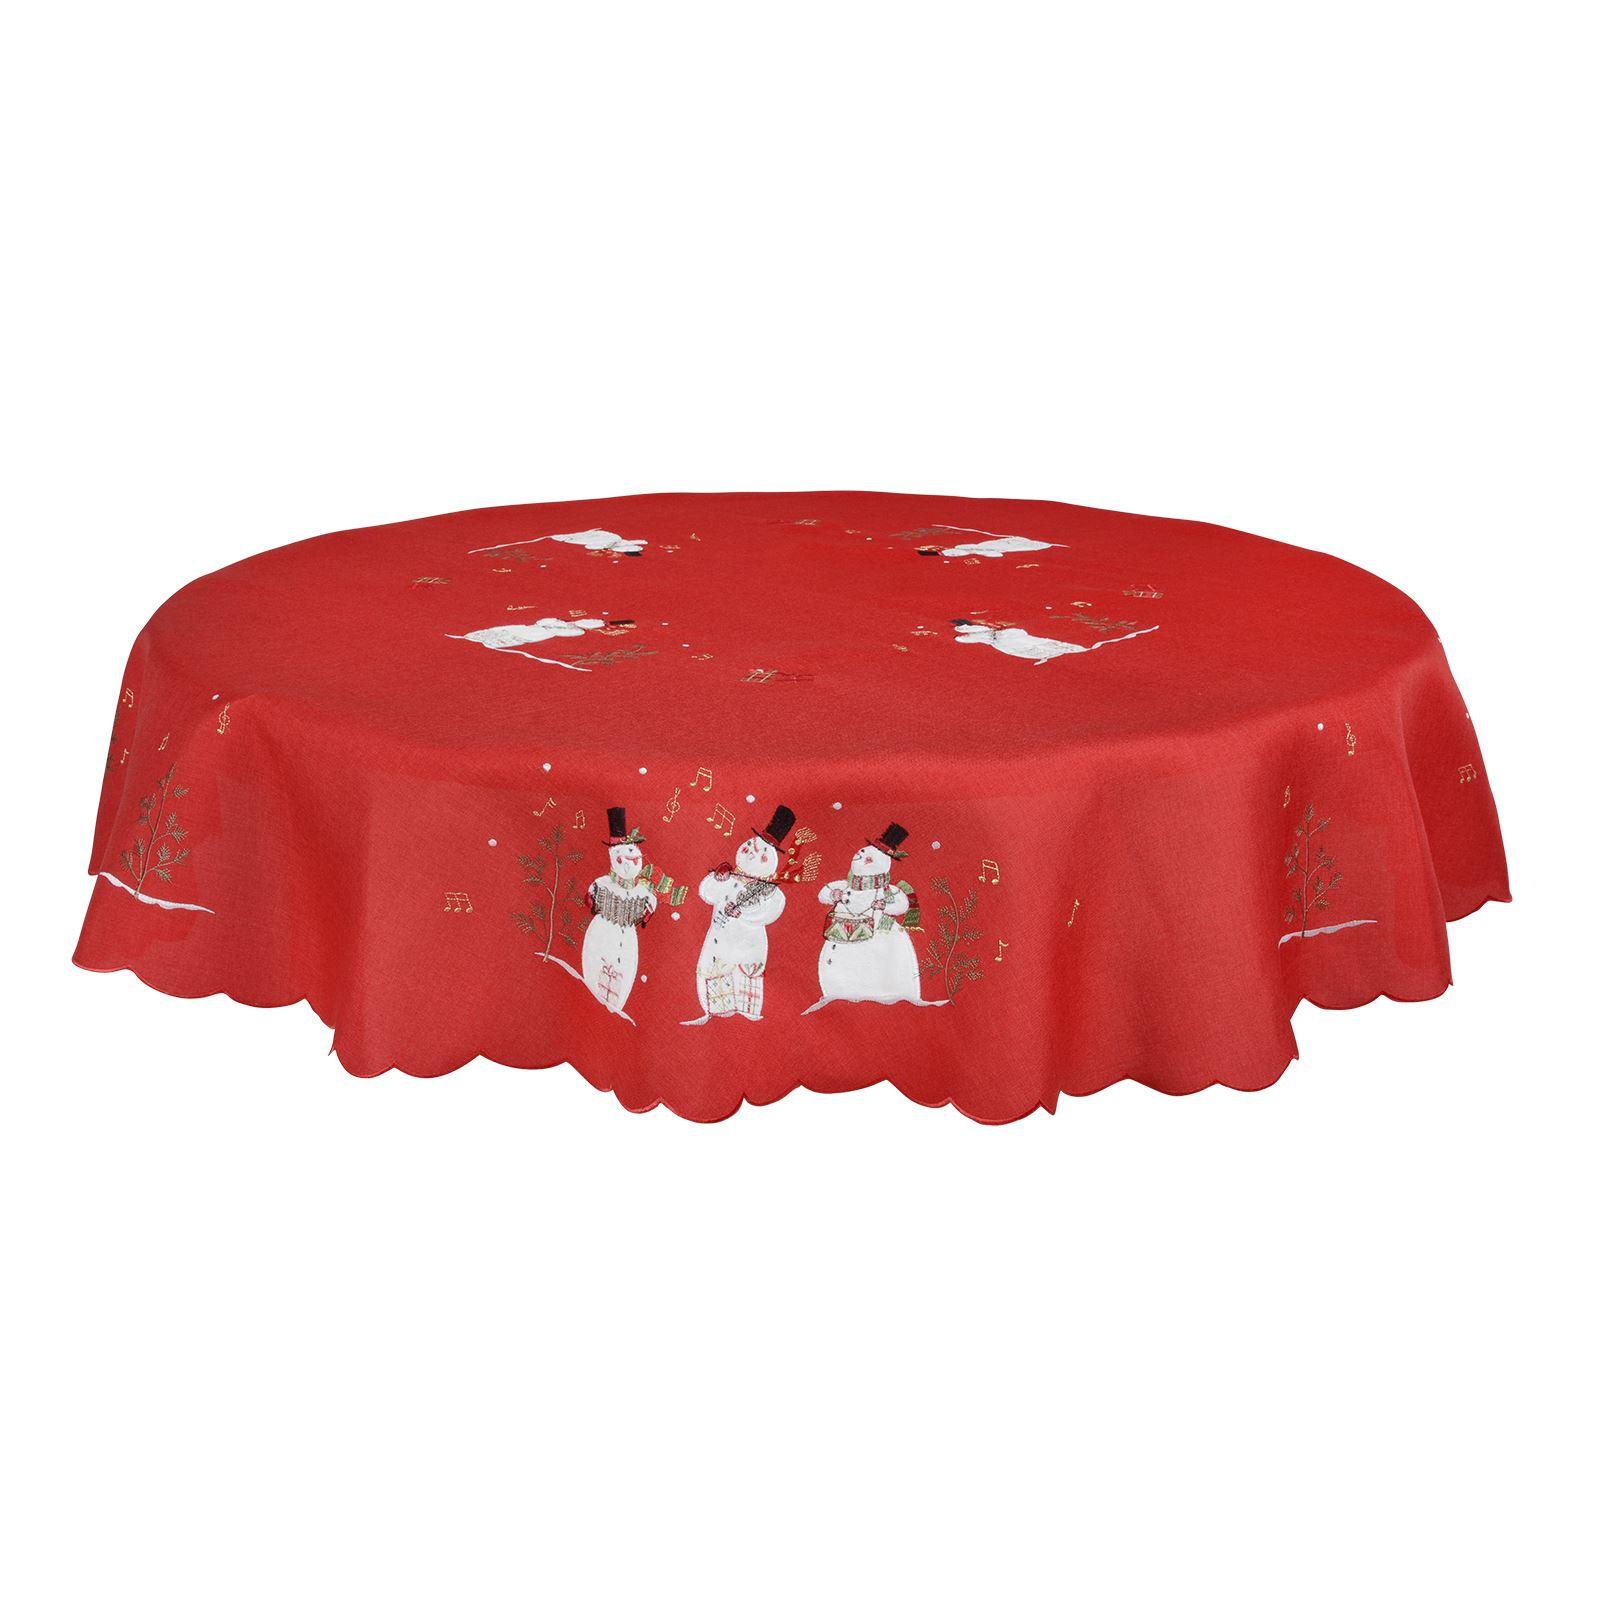 Christmas-Tablecloth-Festive-Pattern-Rectangle-Round-Fabric-Xmas-Room-Decoration Indexbild 131